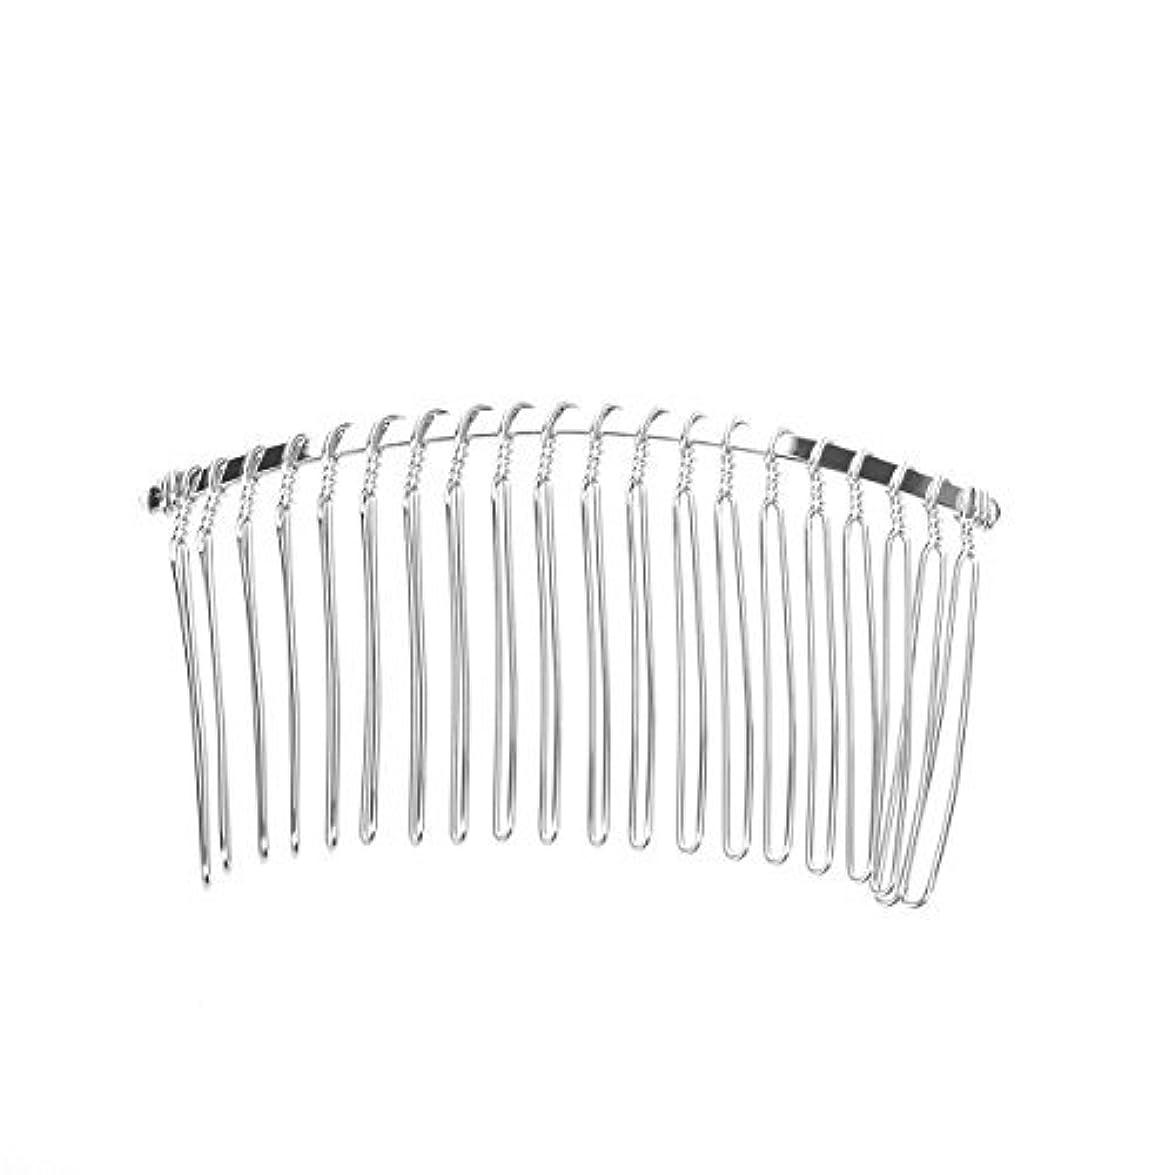 Pixnor 7.8cm 20 Teeth Fancy DIY Metal Wire Hair Clip Comb Bridal Wedding Veil Comb (Silver) [並行輸入品]